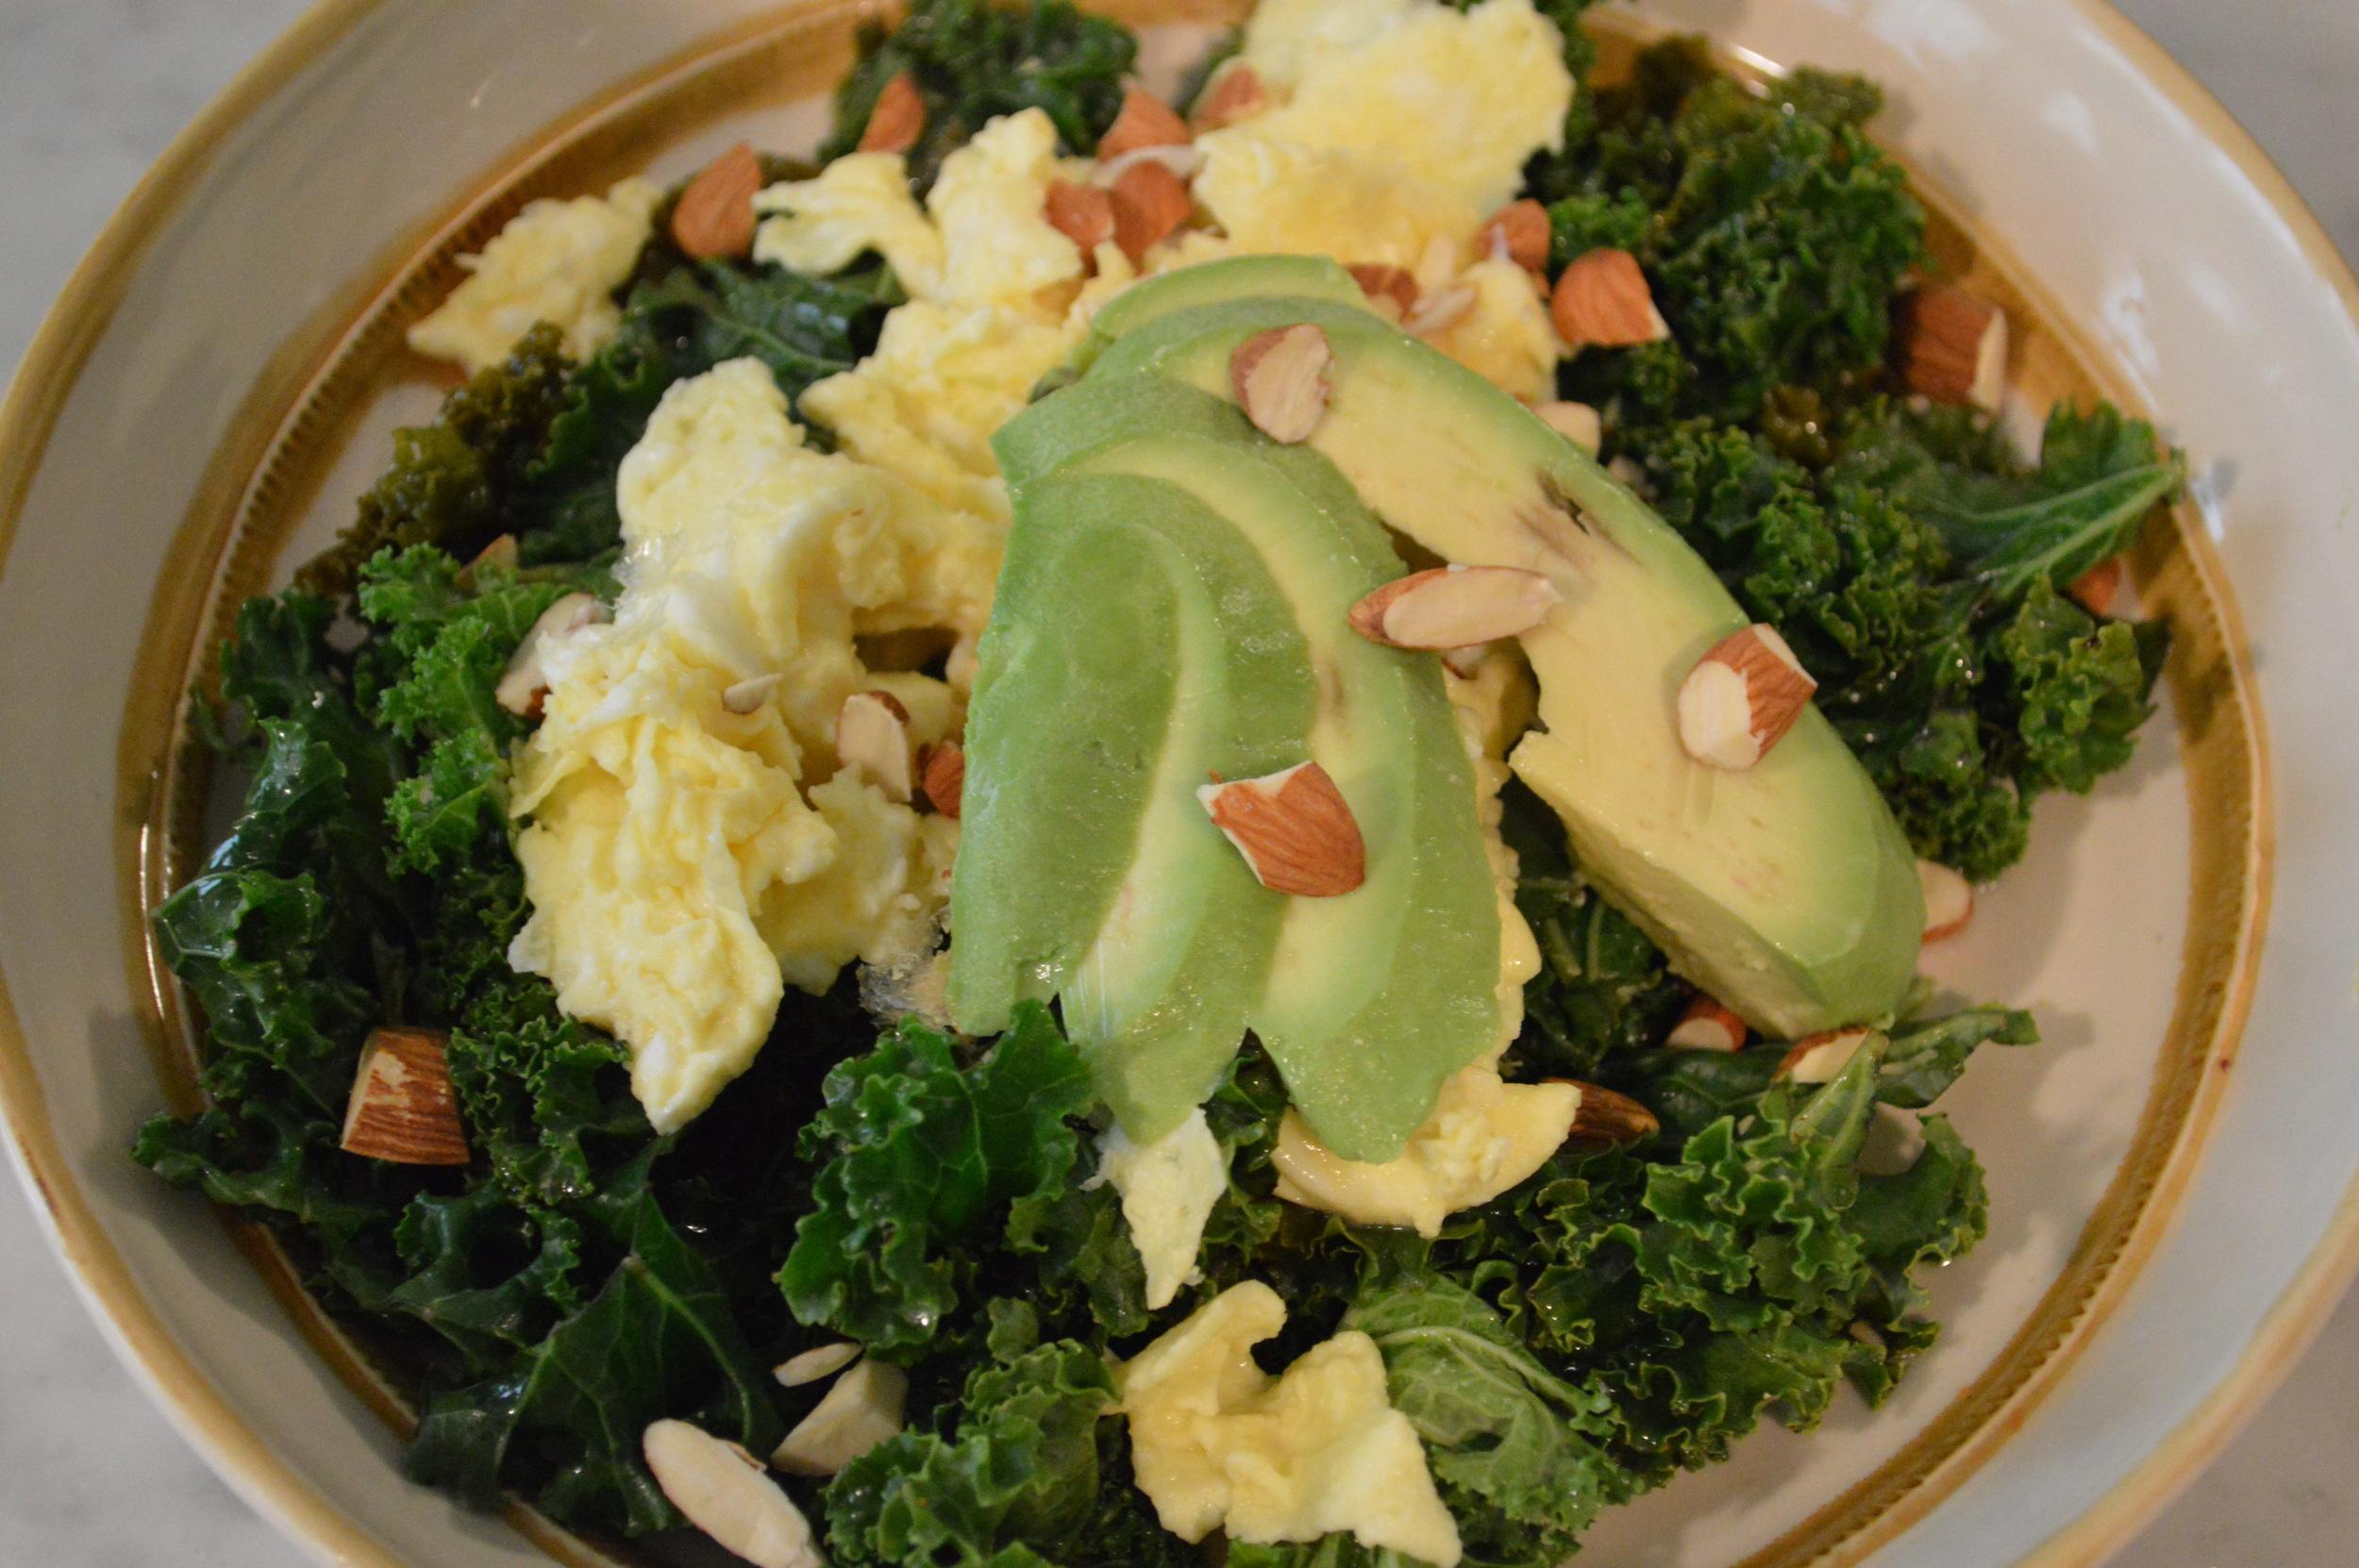 Sauteed kale, Scrambled Eggs & Avocado